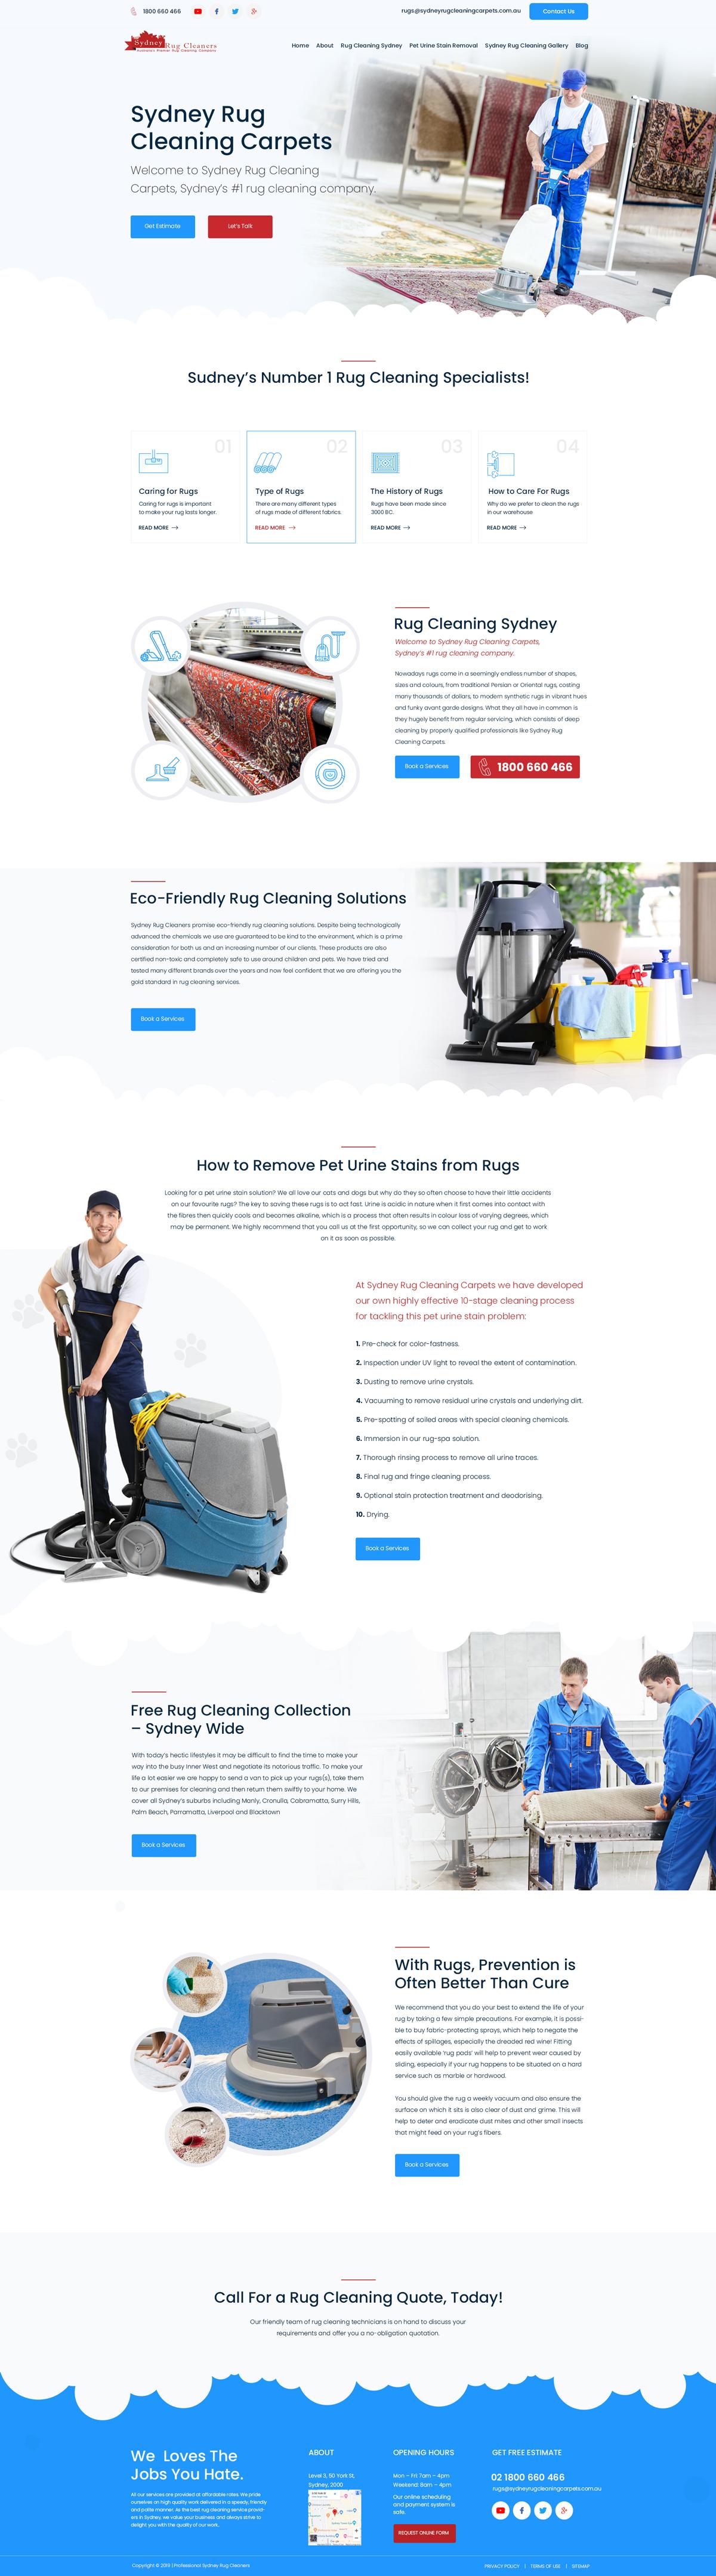 Sydney Rug Cleaning